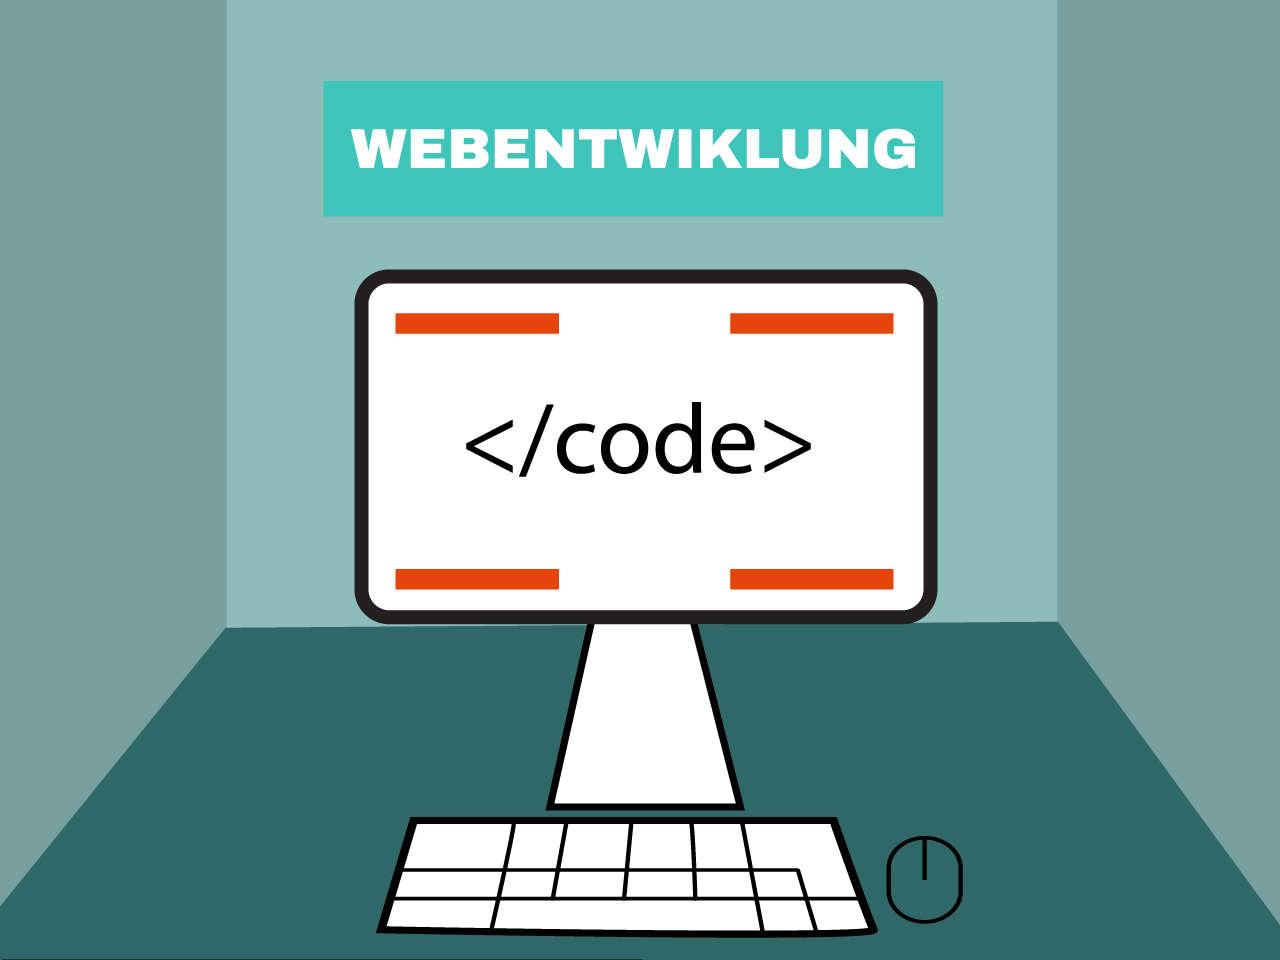 kasiweb-Webentwicklung